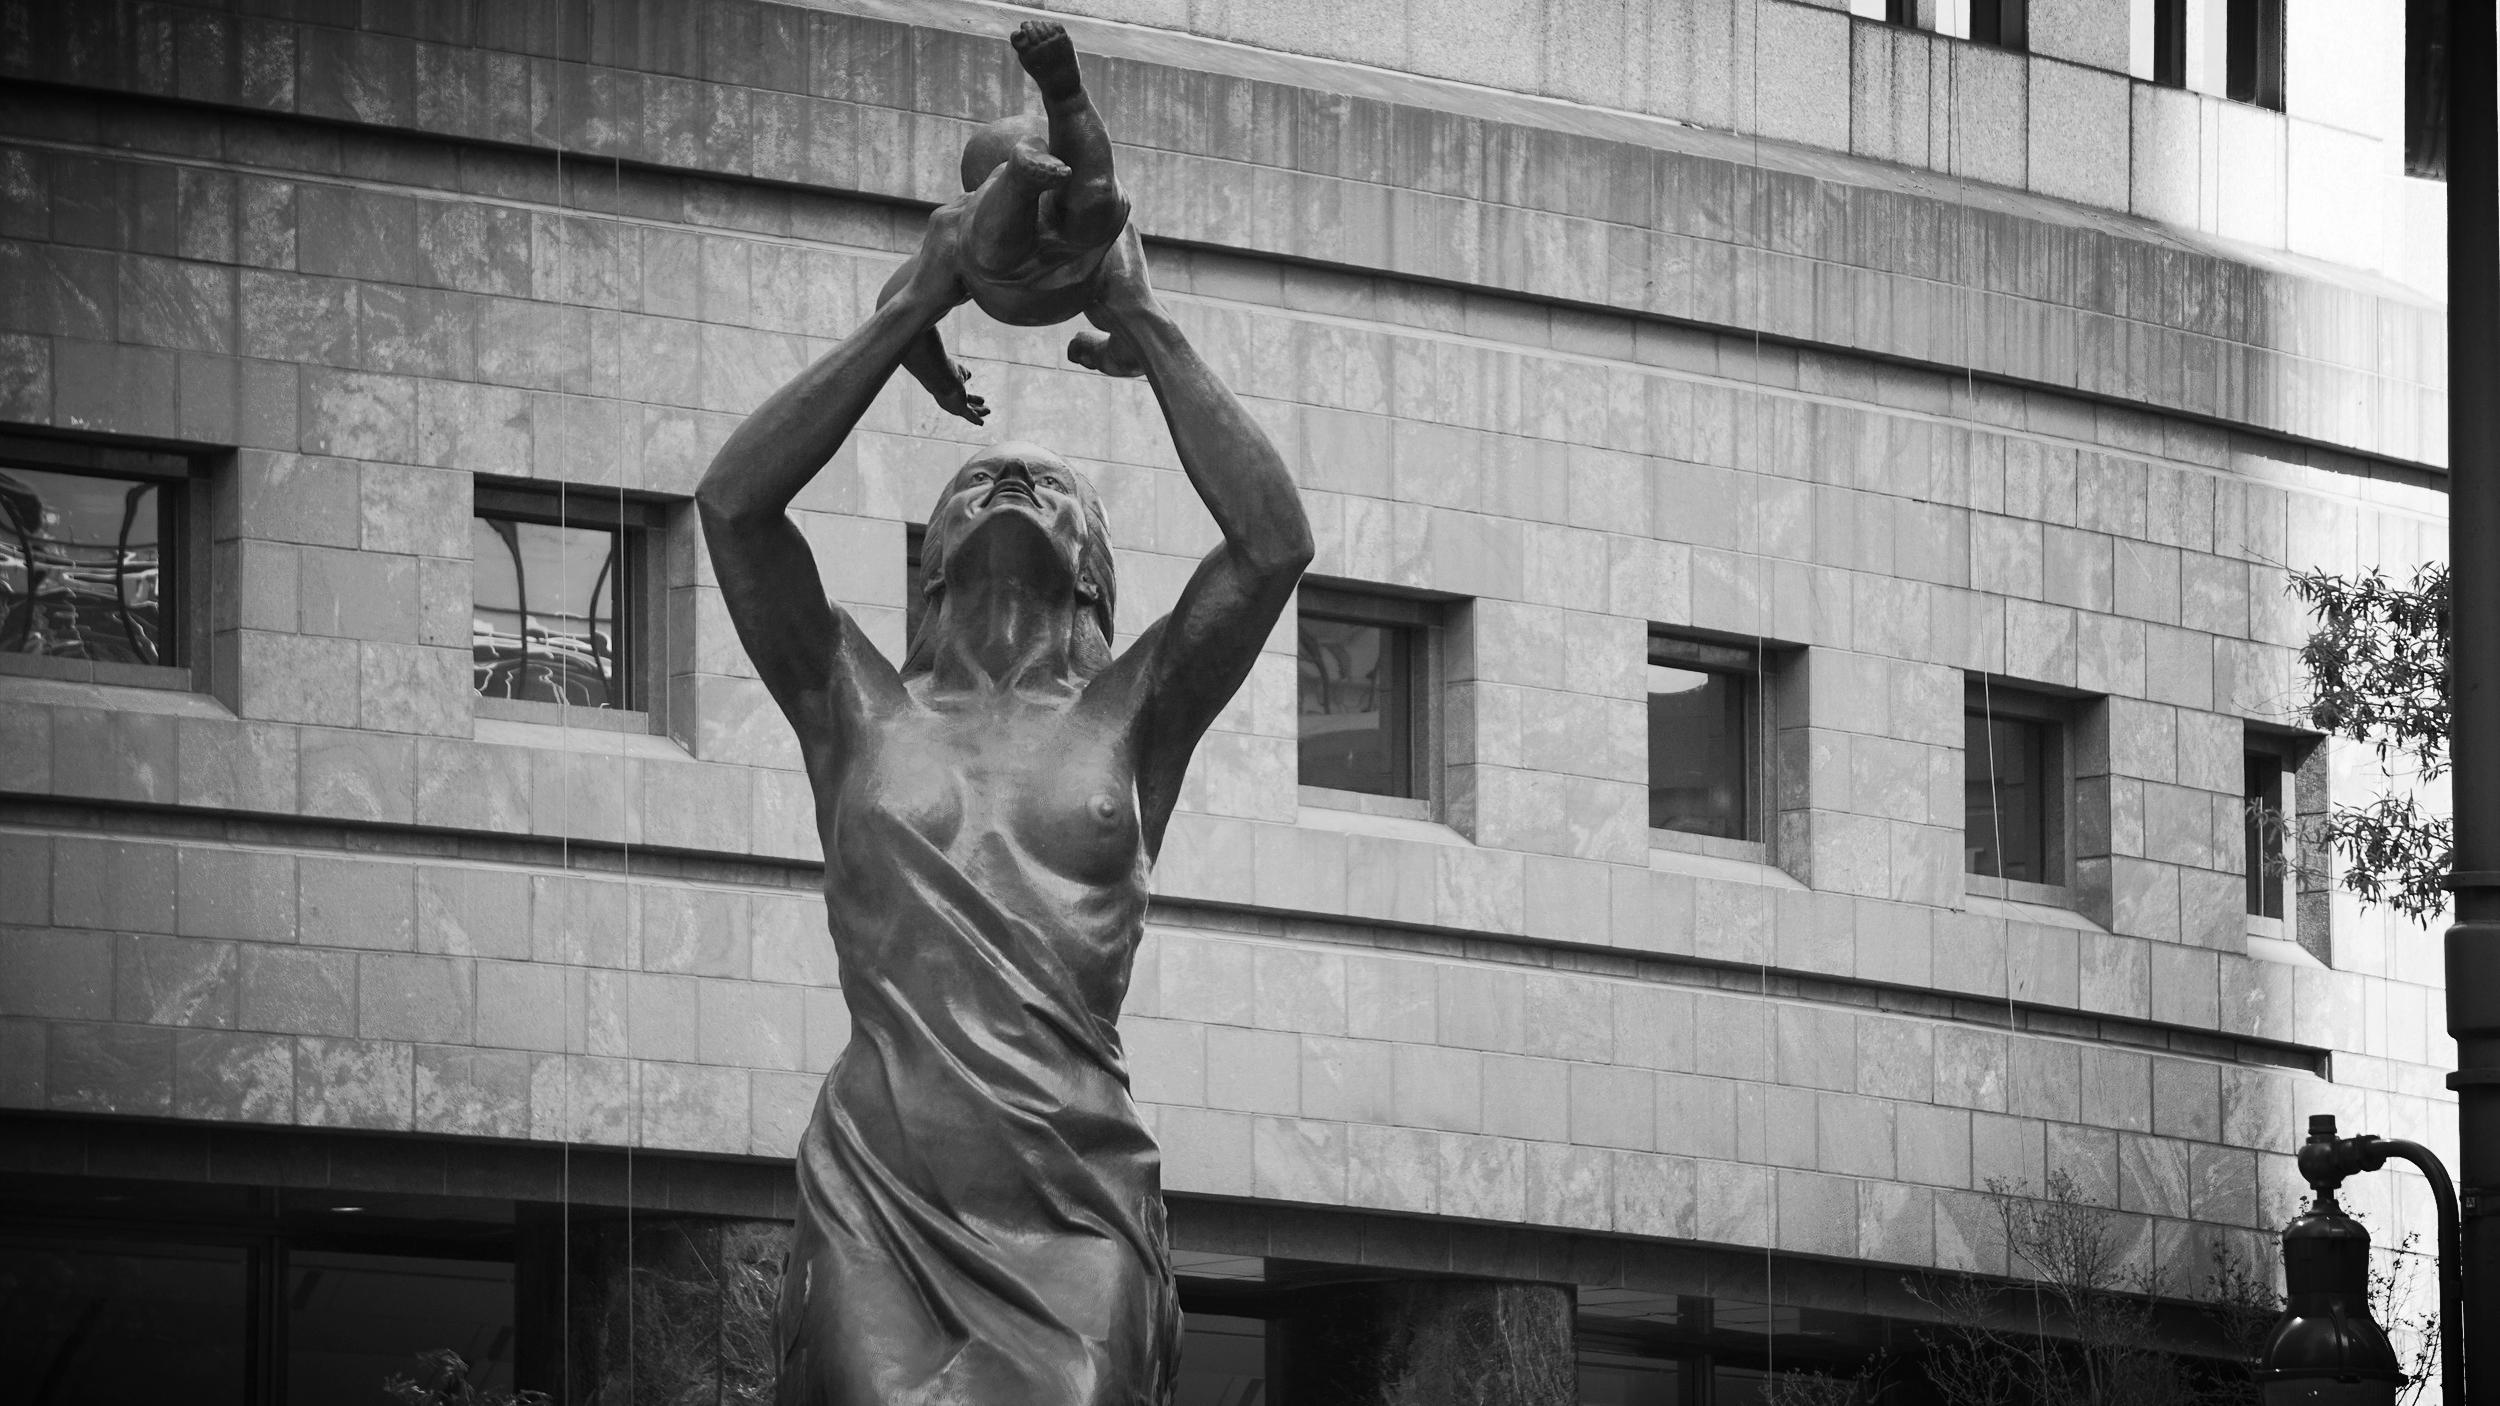 Uptown Statue Revised.jpg